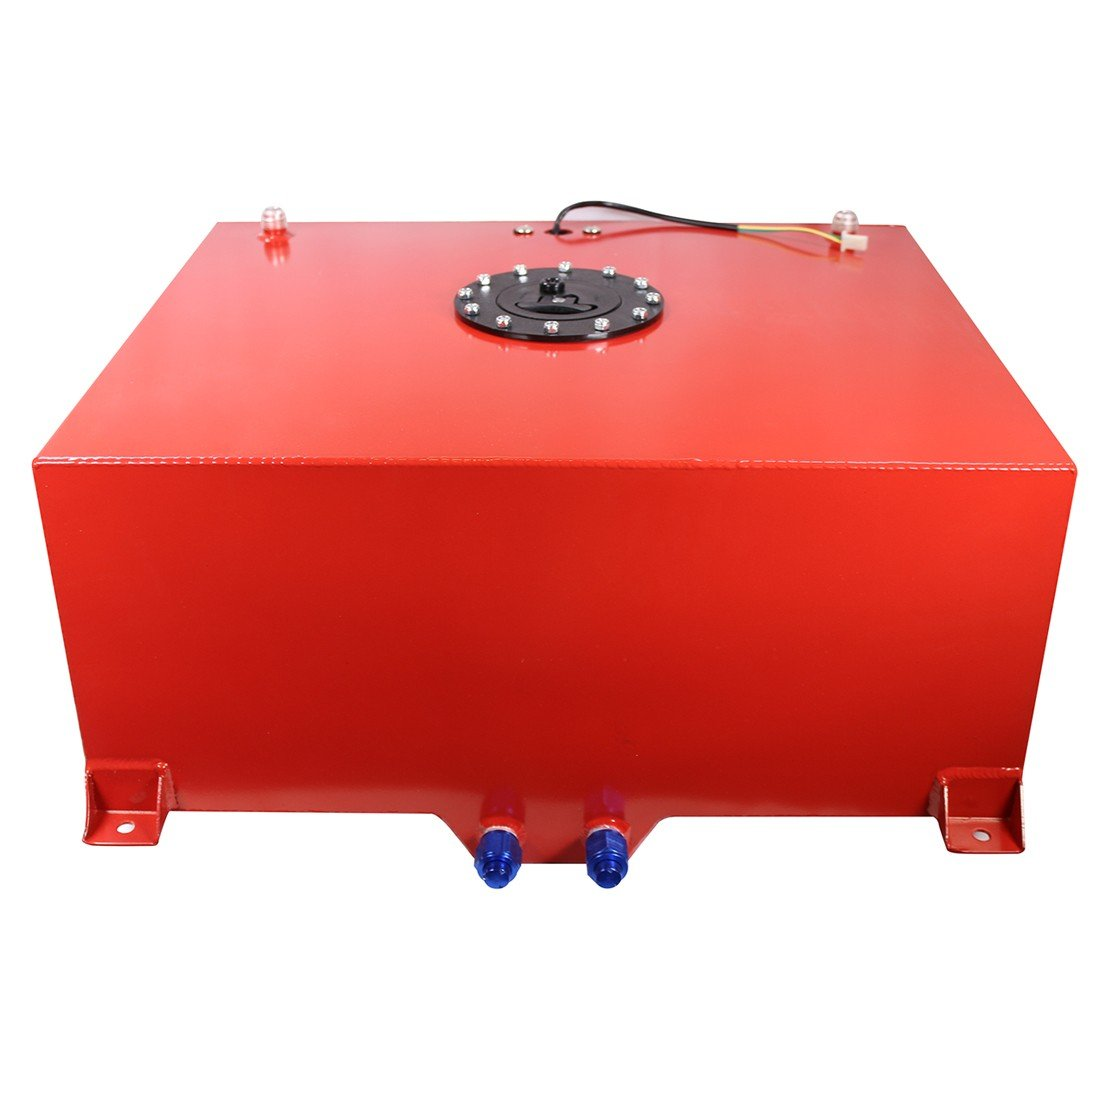 15 Gallon OEM Polished Aluminum Racing Drift Fuel Cell Gas Tank & Level Sender DEMOTOR